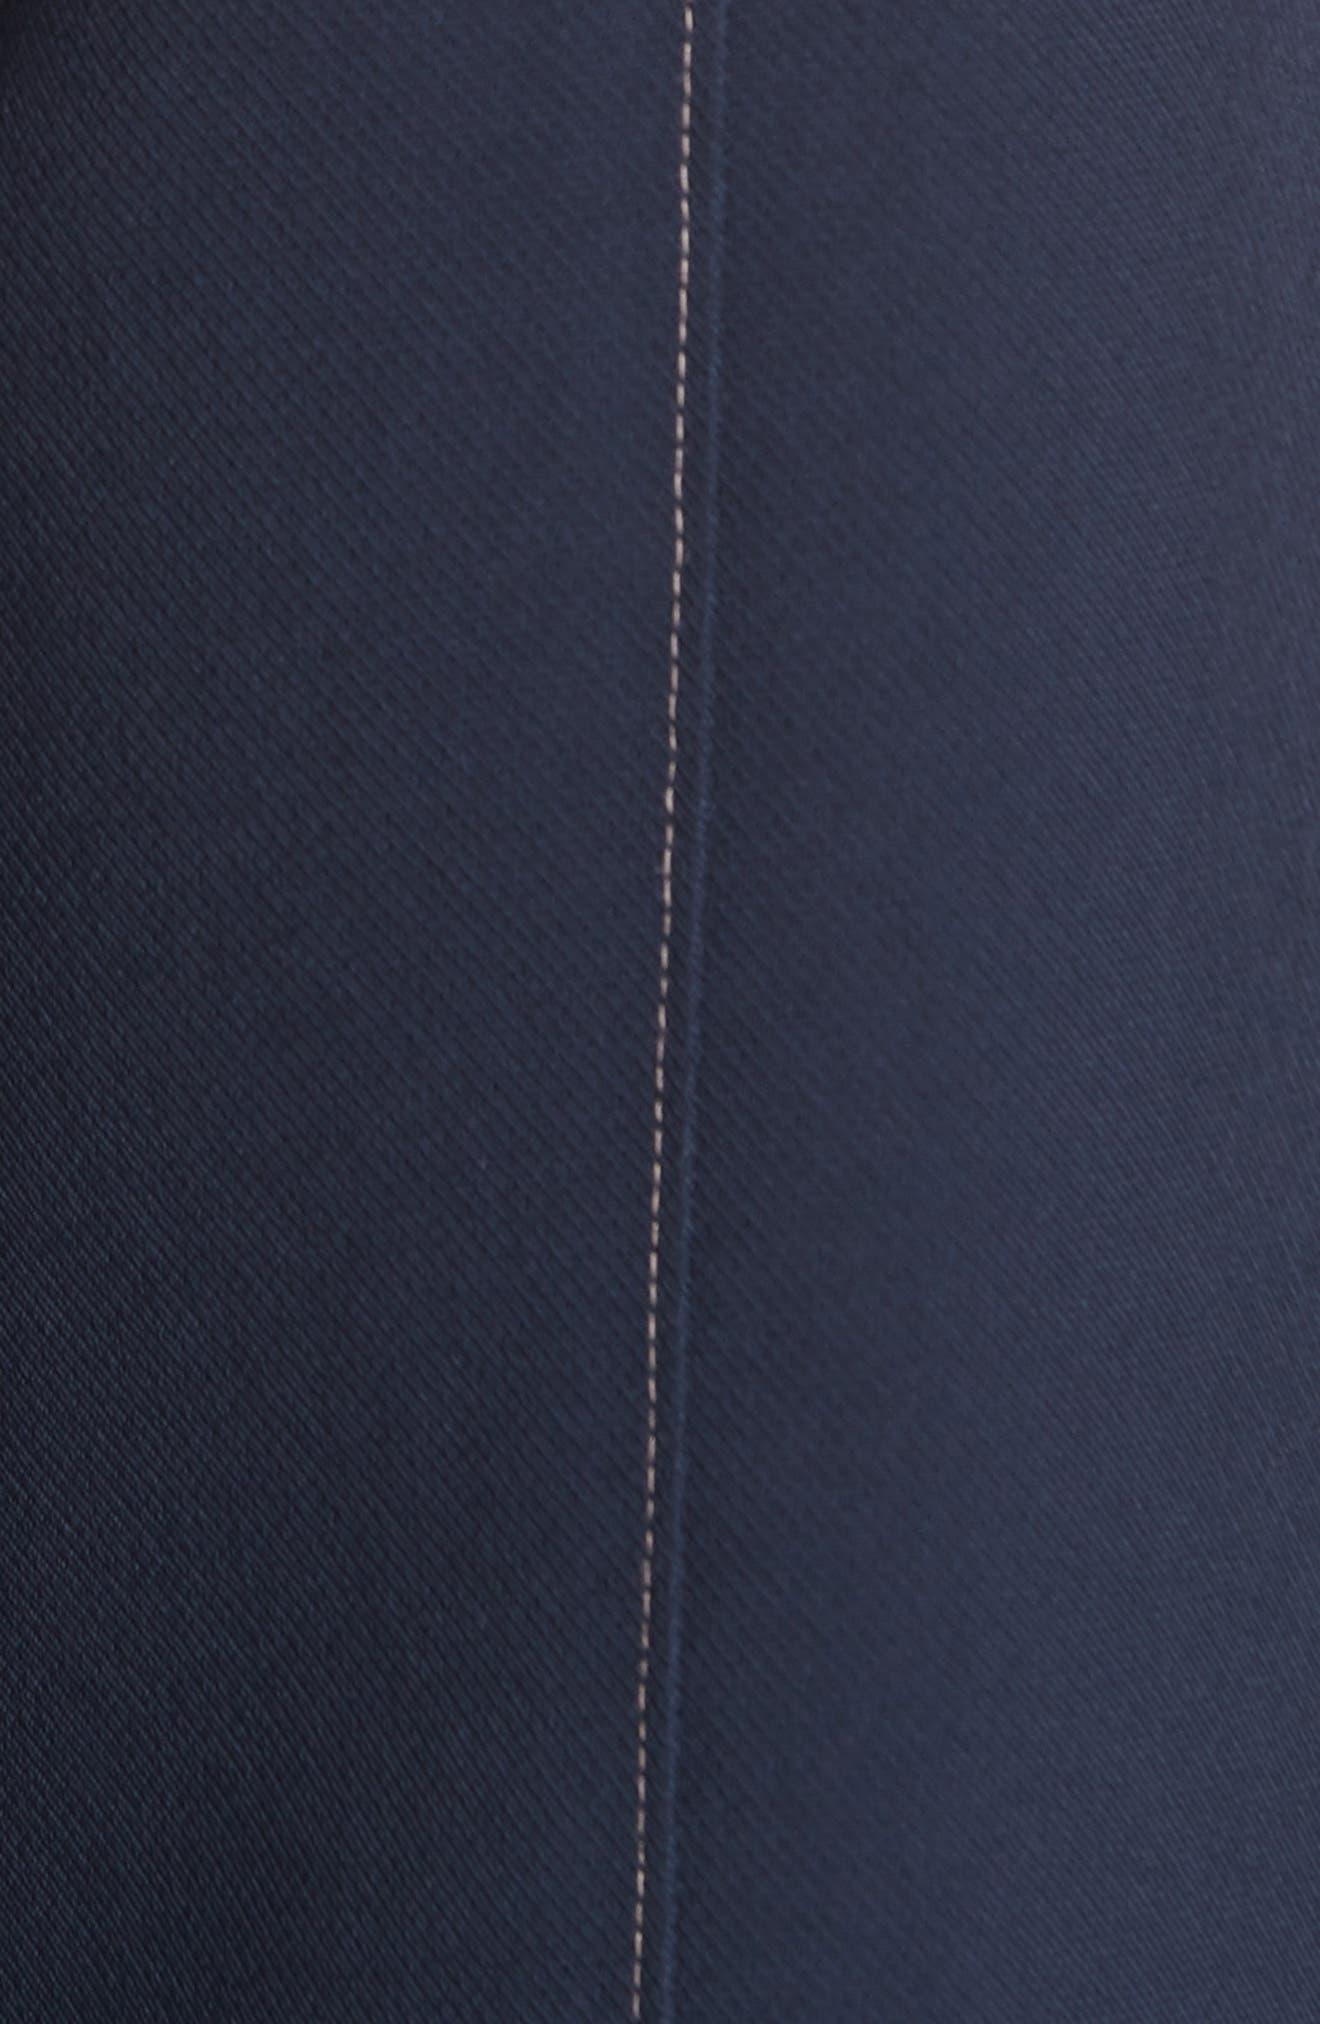 Lapari Pintuck Trousers,                             Alternate thumbnail 5, color,                             Navy